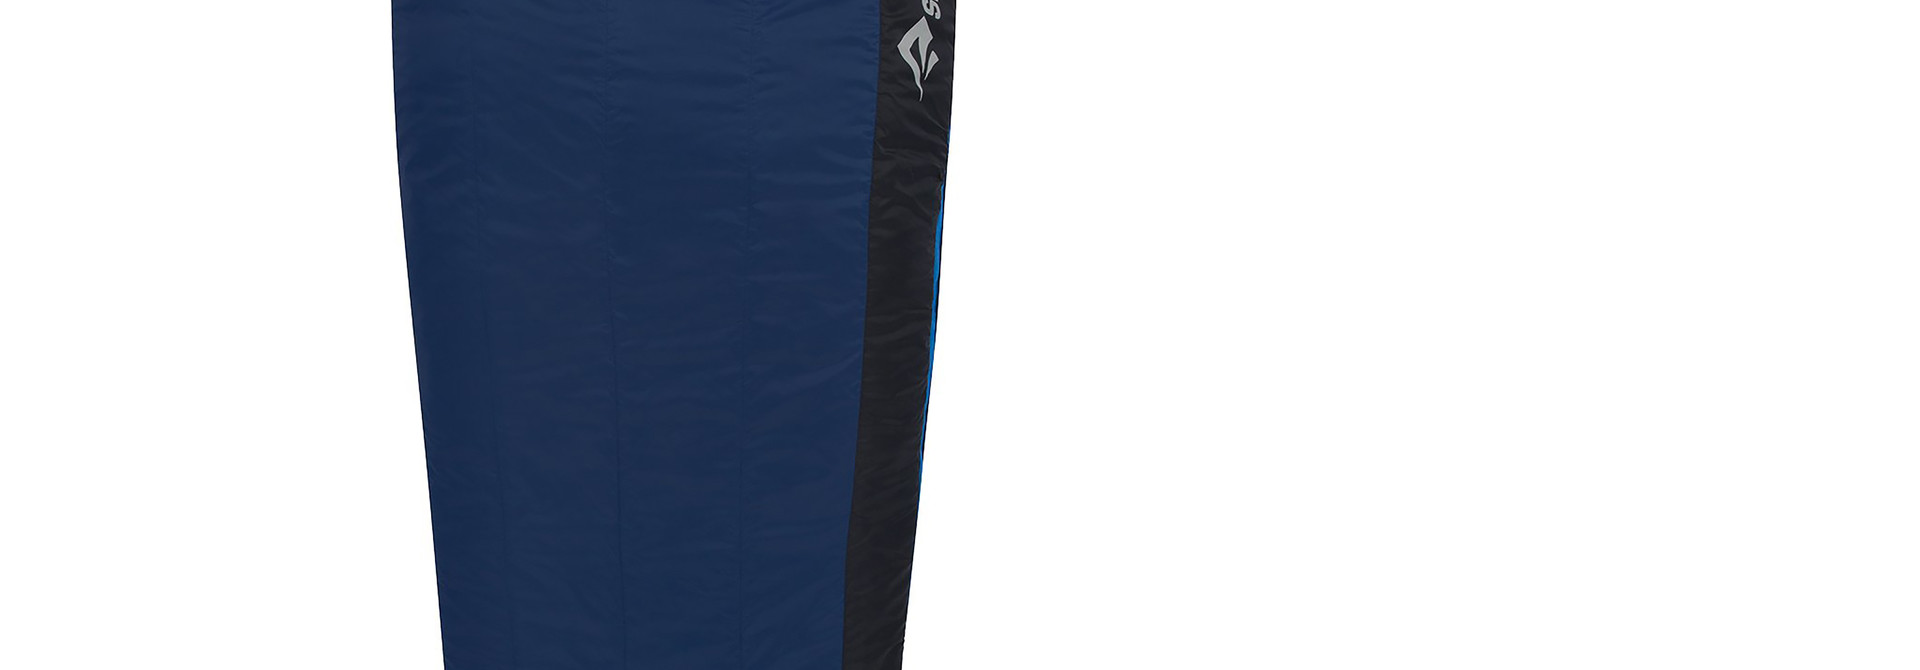 Trailhead Synthetic Sleeping Bag, 30F, Long